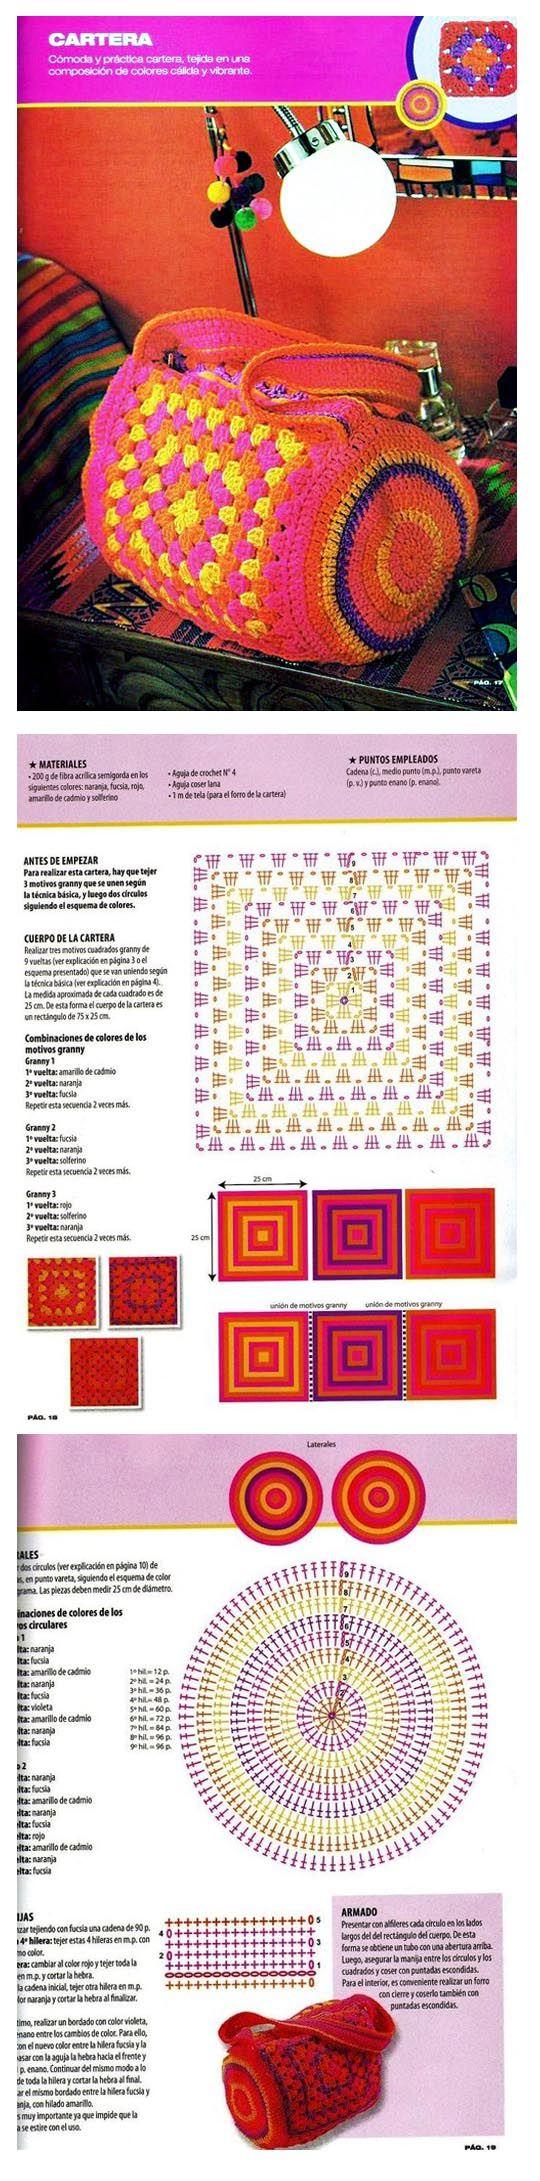 Barrel bag with granny squares - crochet pattern